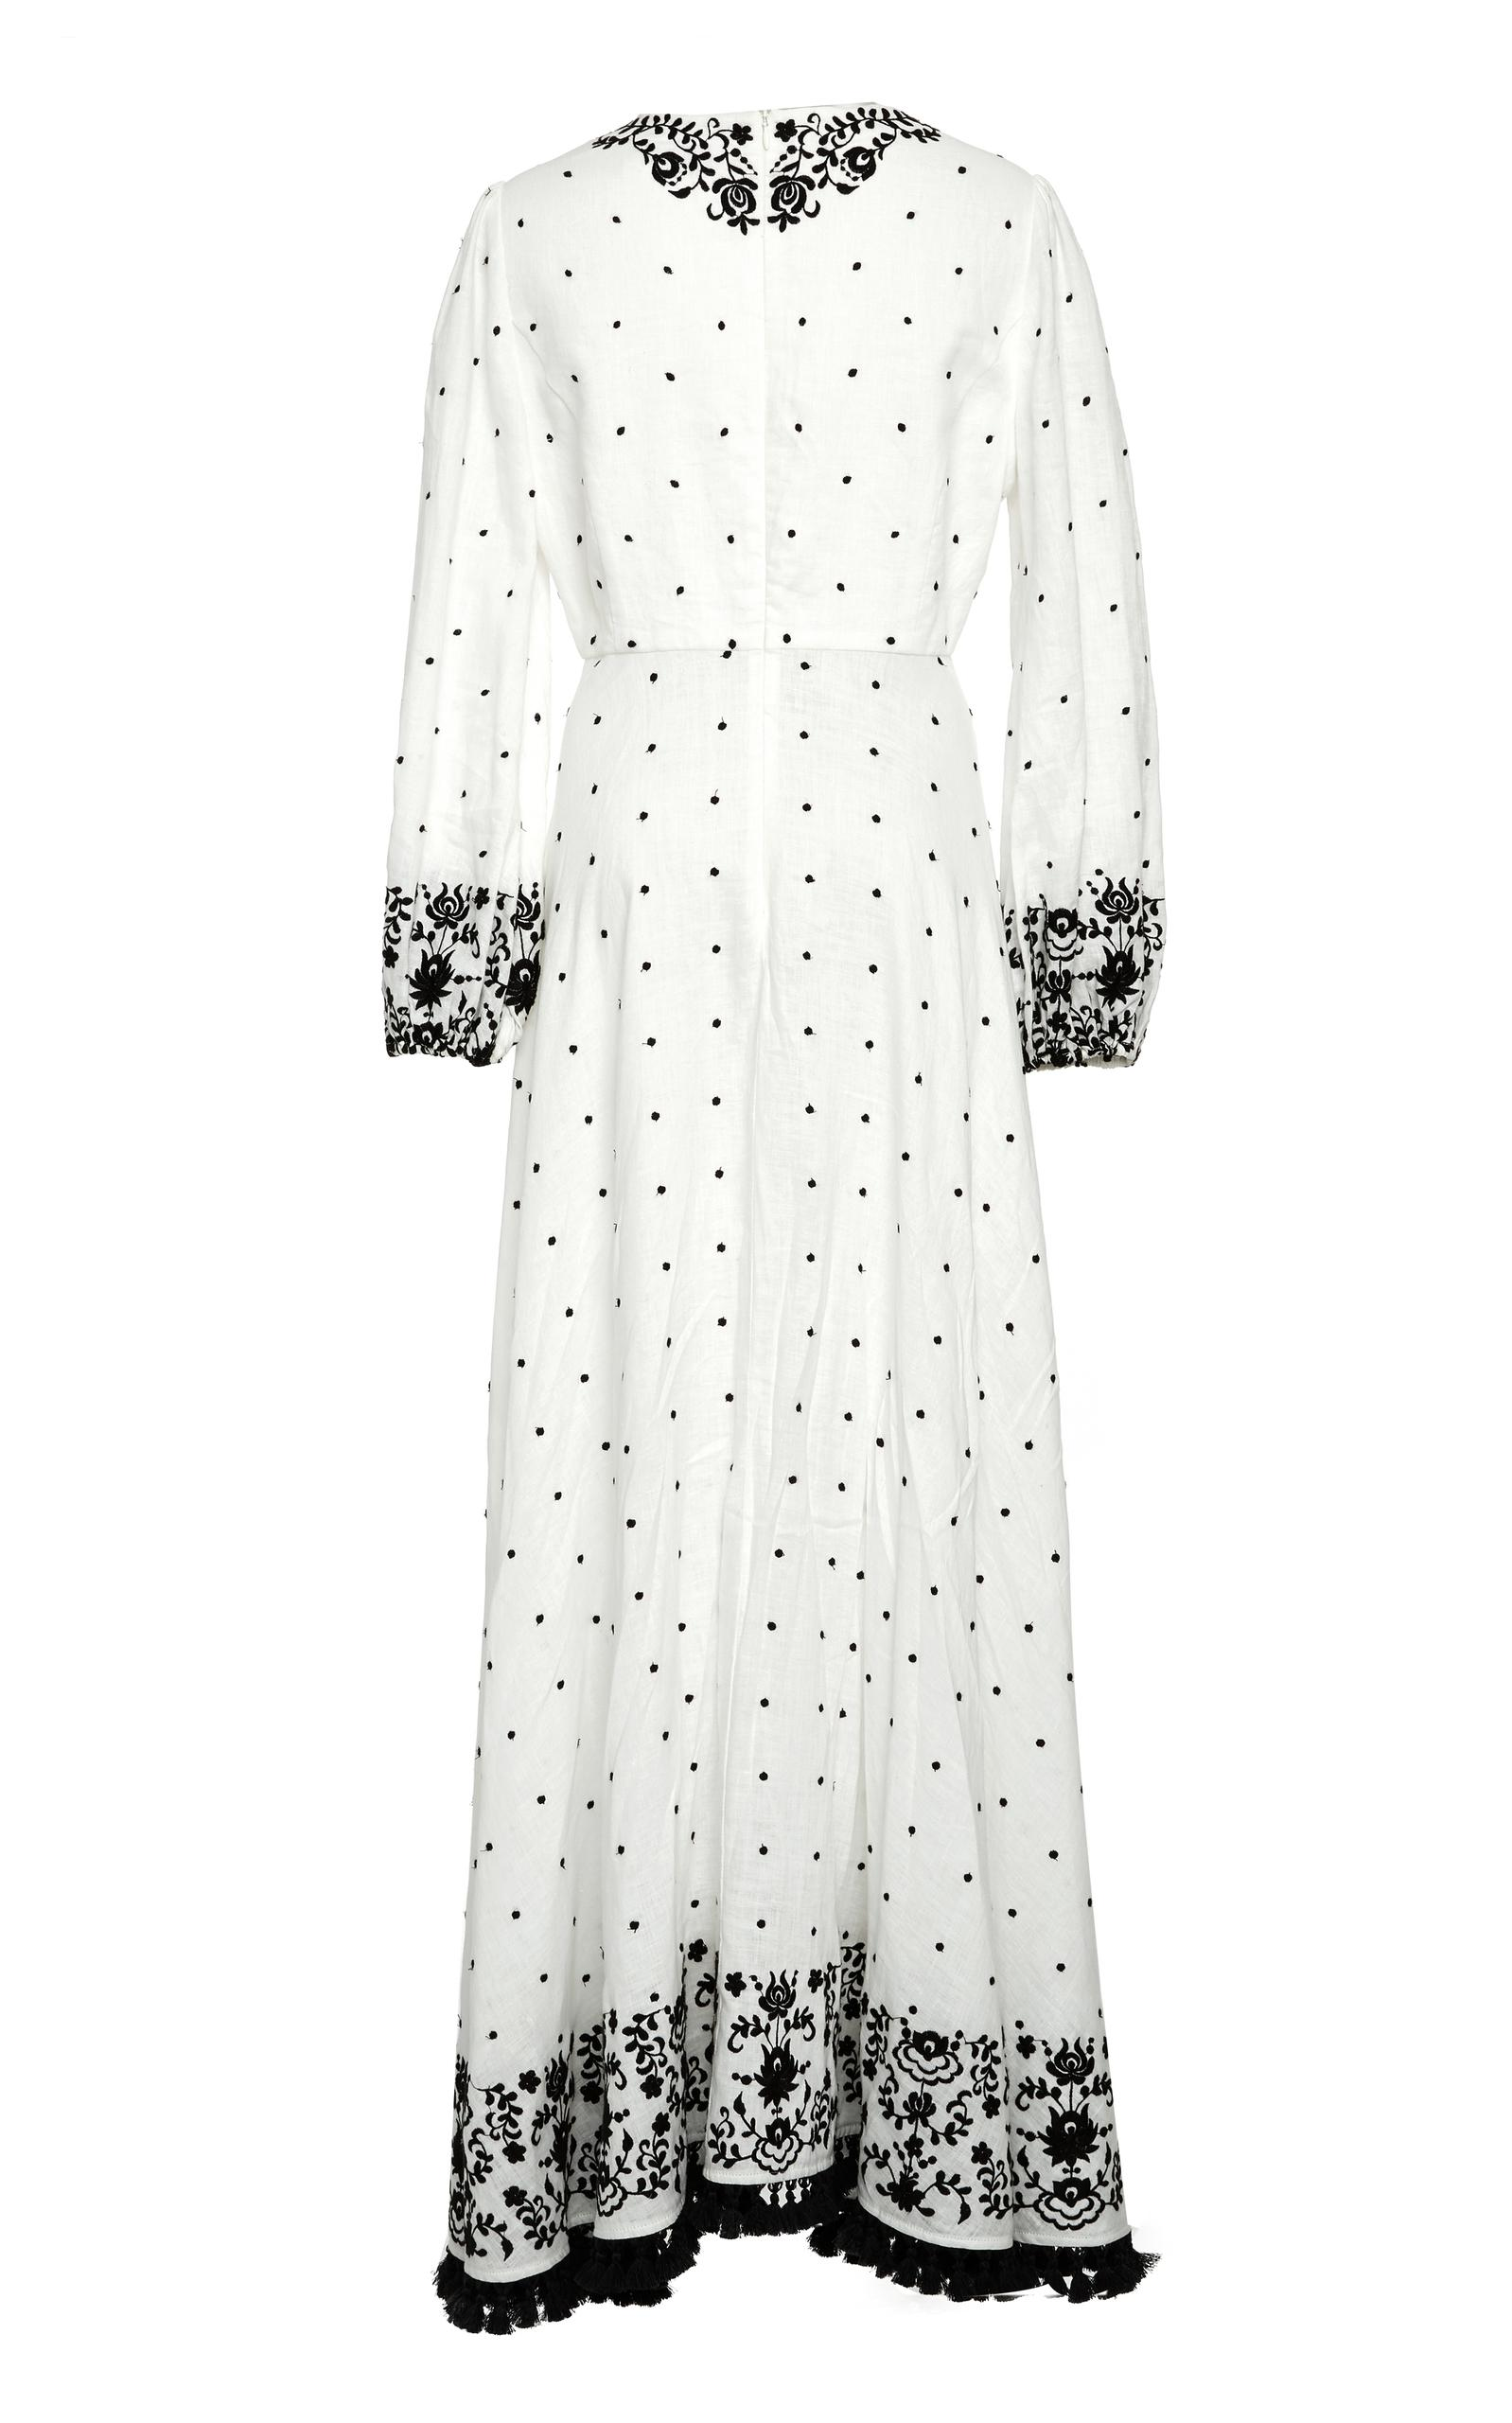 Tali embroidered linen maxi dress Zimmermann Outlet Shop 2018 Newest Popular Sale Online ePkmT296